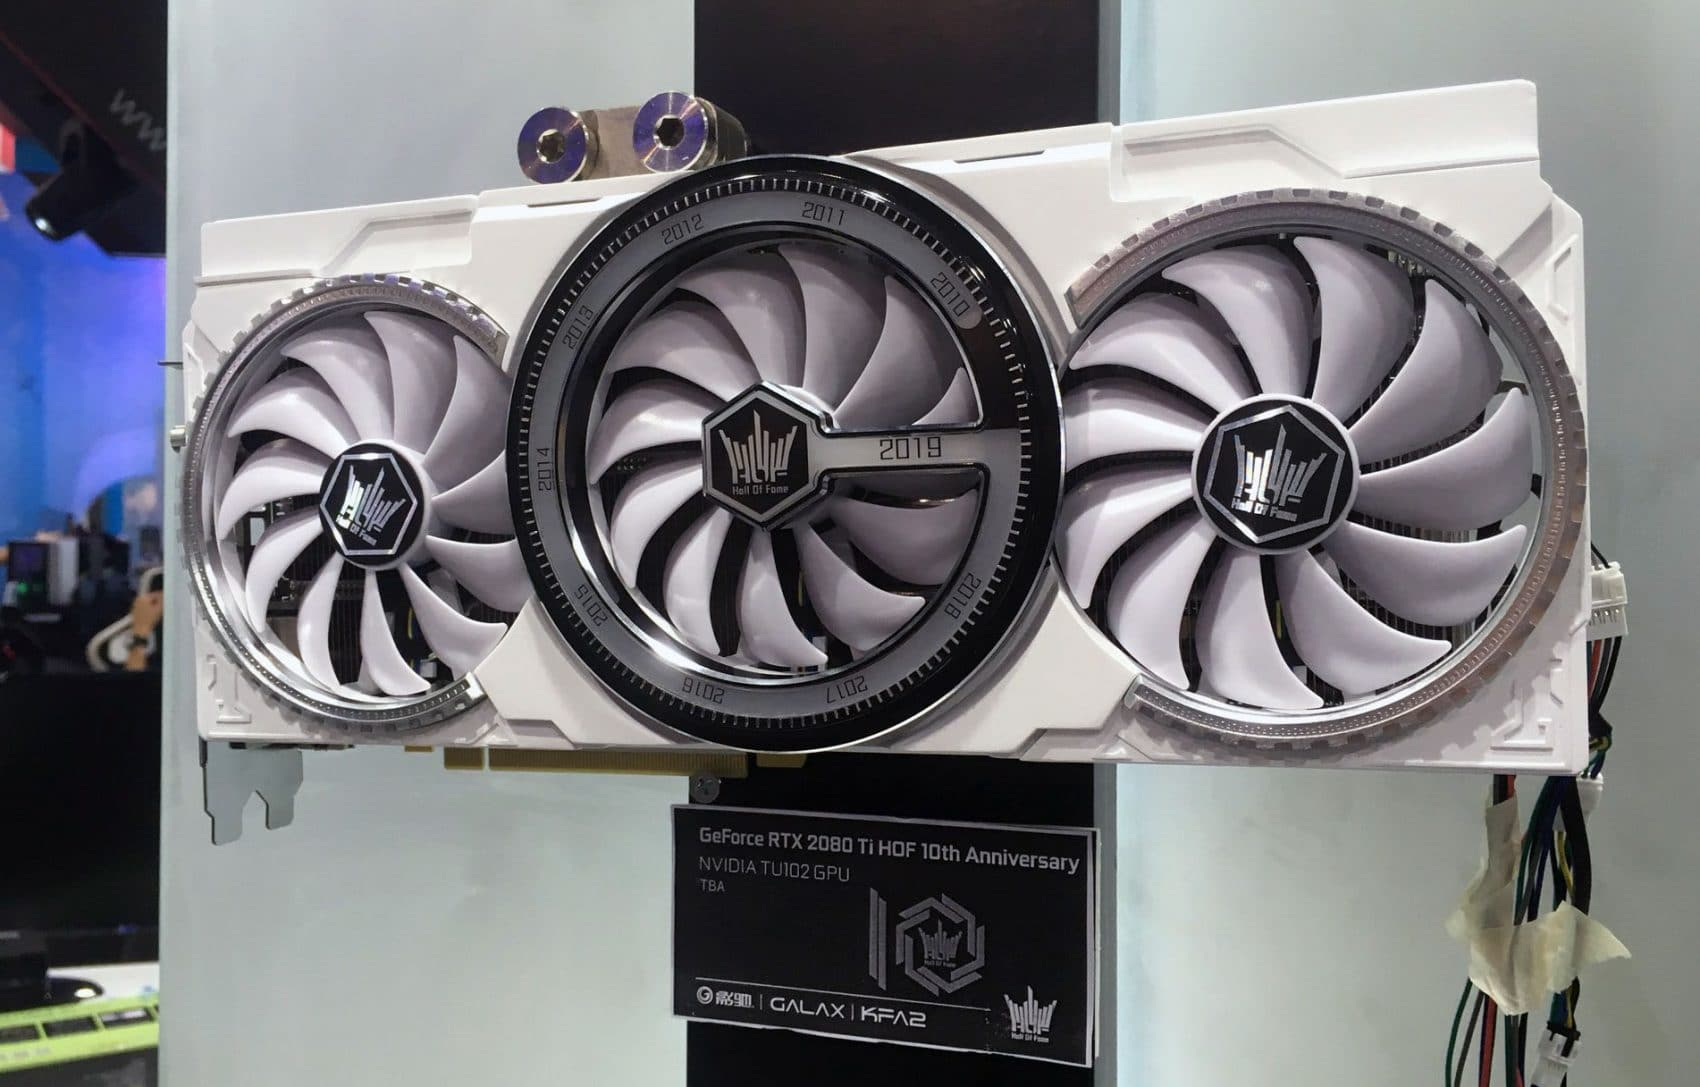 GALAX GeForce RTX 2080 Ti HOF 10th Anniversary Edition